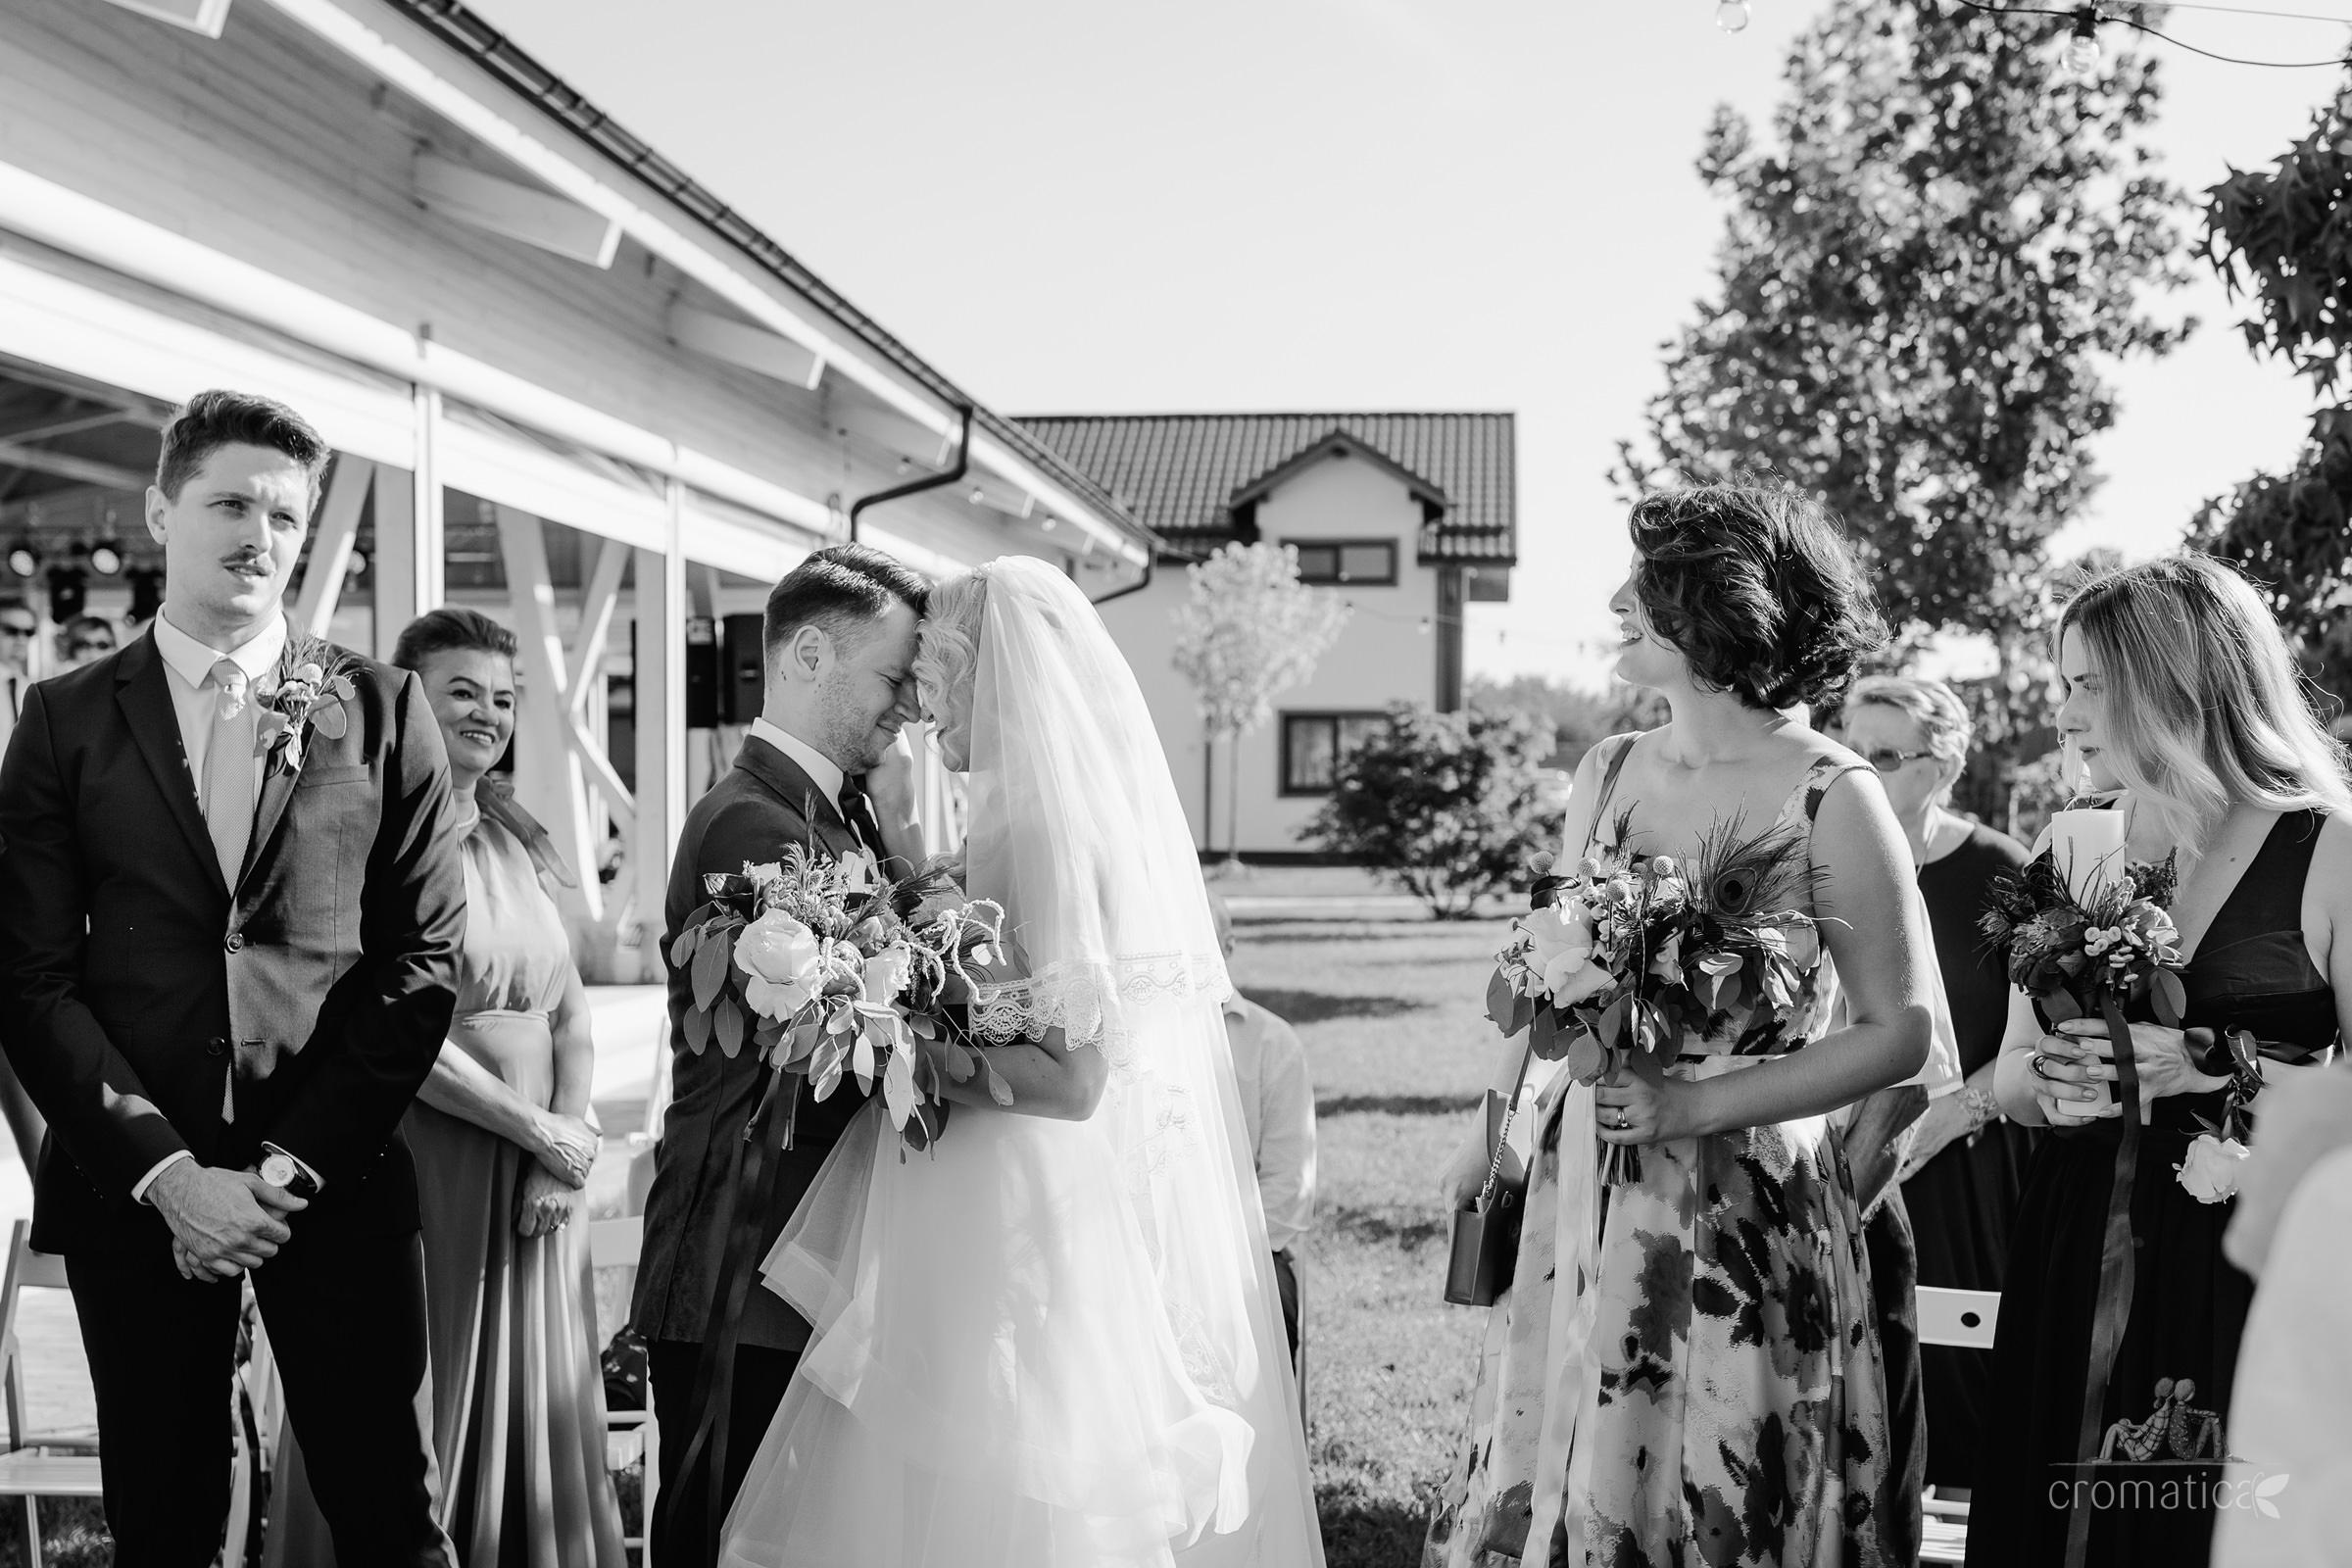 ana mihai fotografii nunta gradina lahovari 042